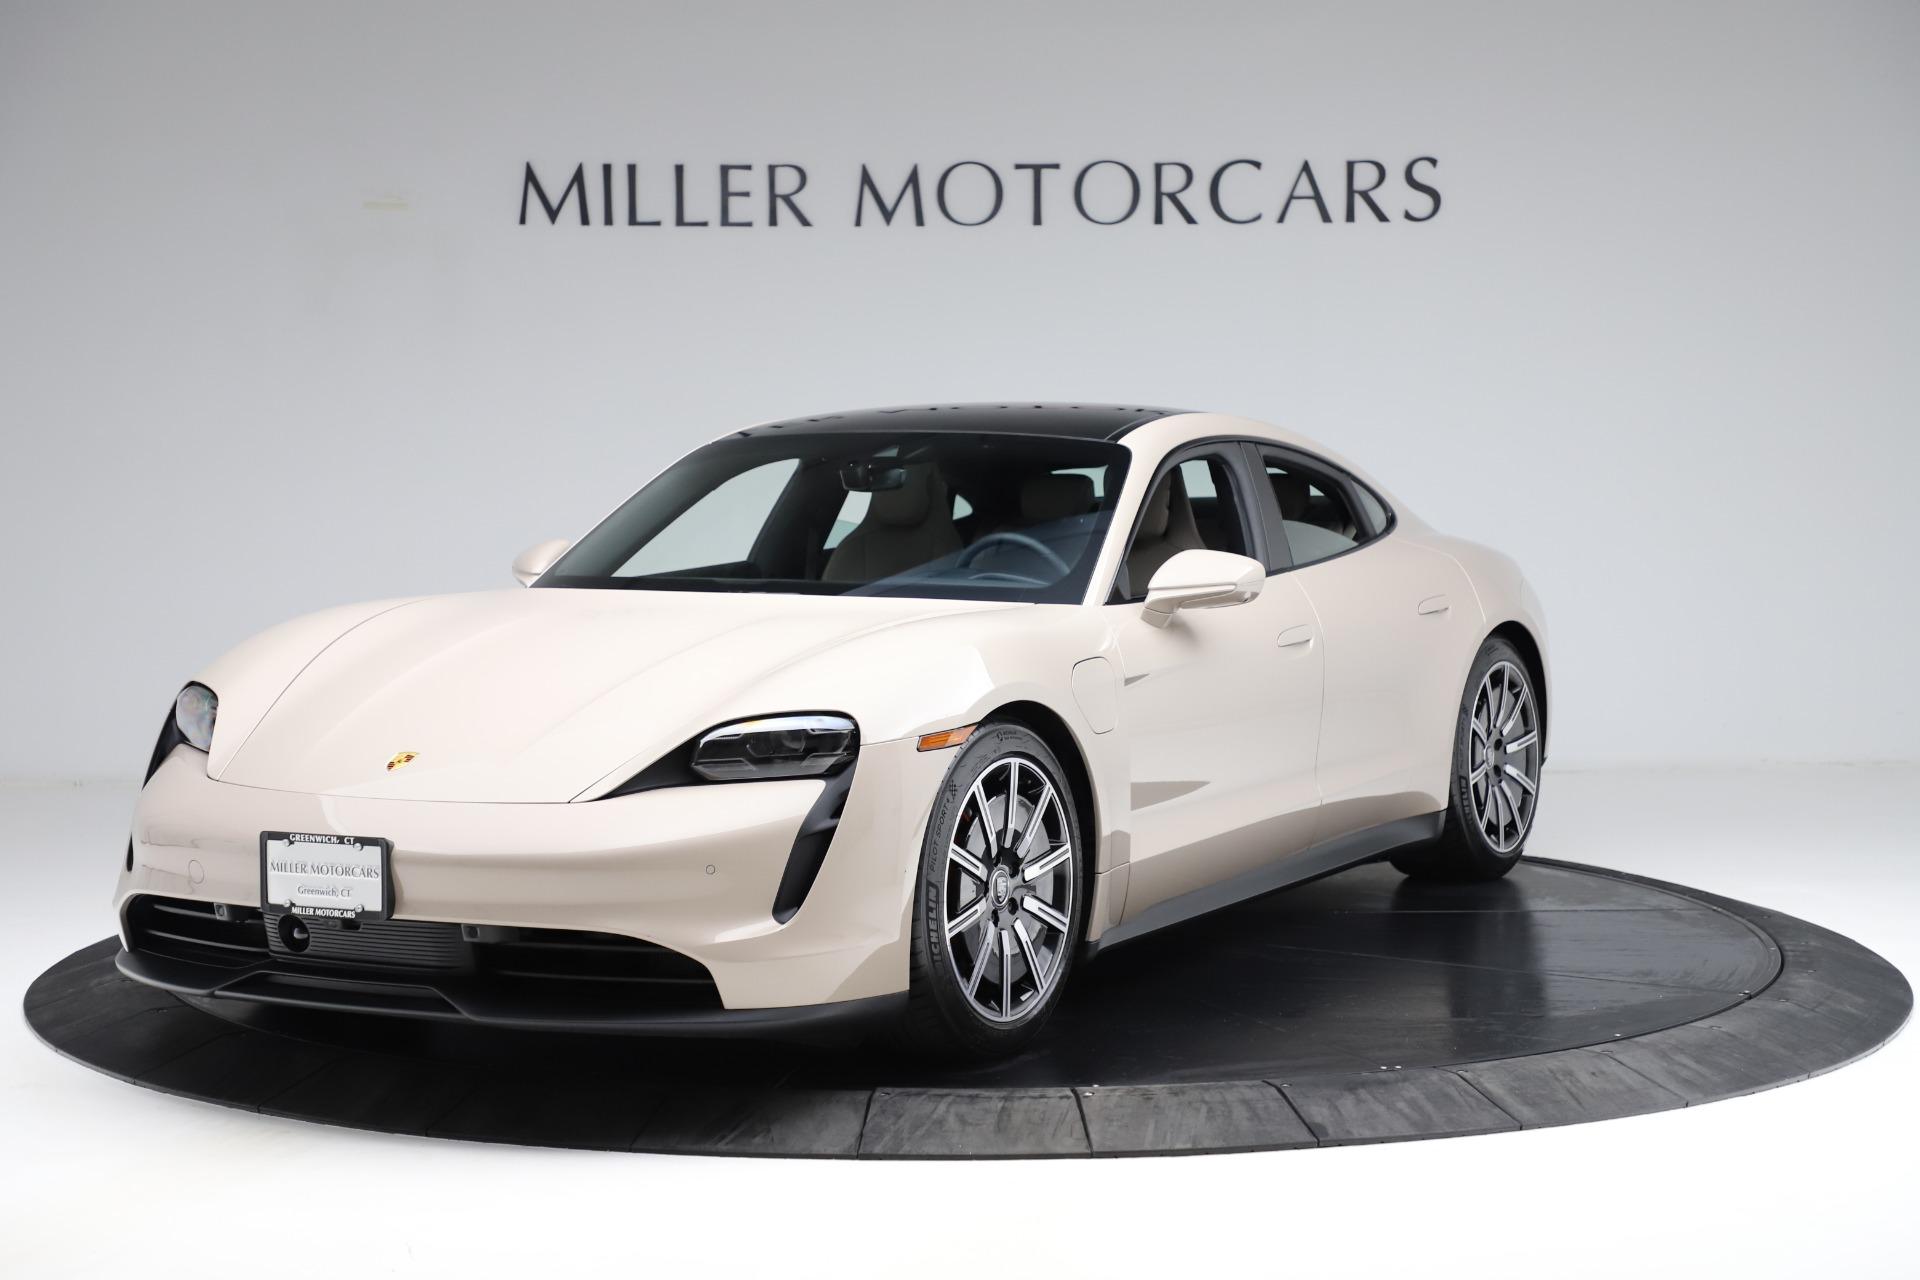 Used 2021 Porsche Taycan 4S for sale $125,900 at Alfa Romeo of Westport in Westport CT 06880 1